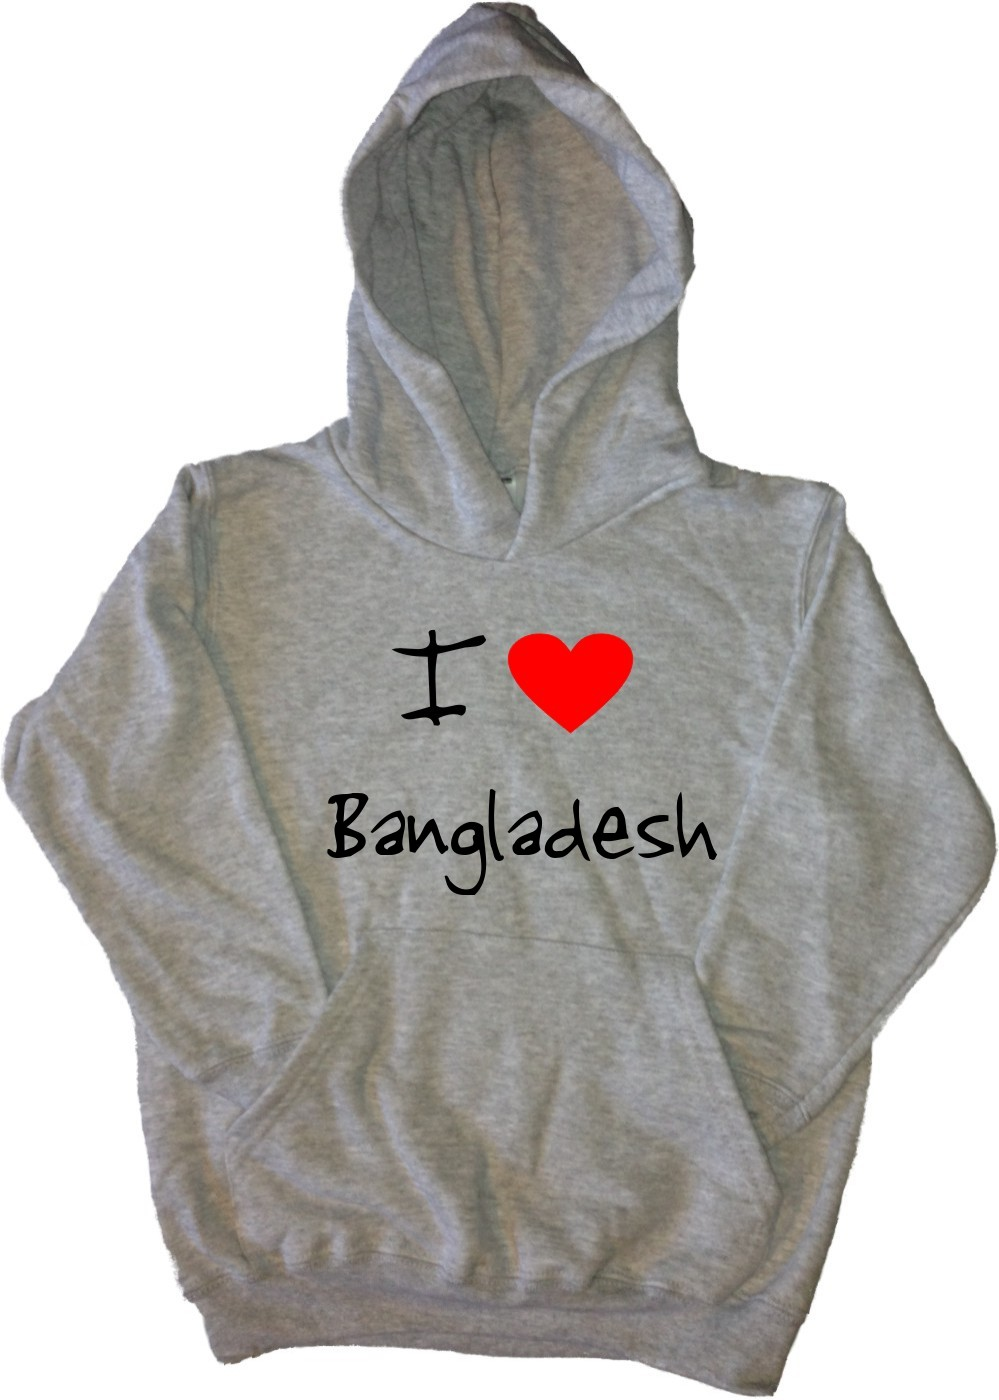 I-Love-Cuore-Bangladesh-Kids-Felpa